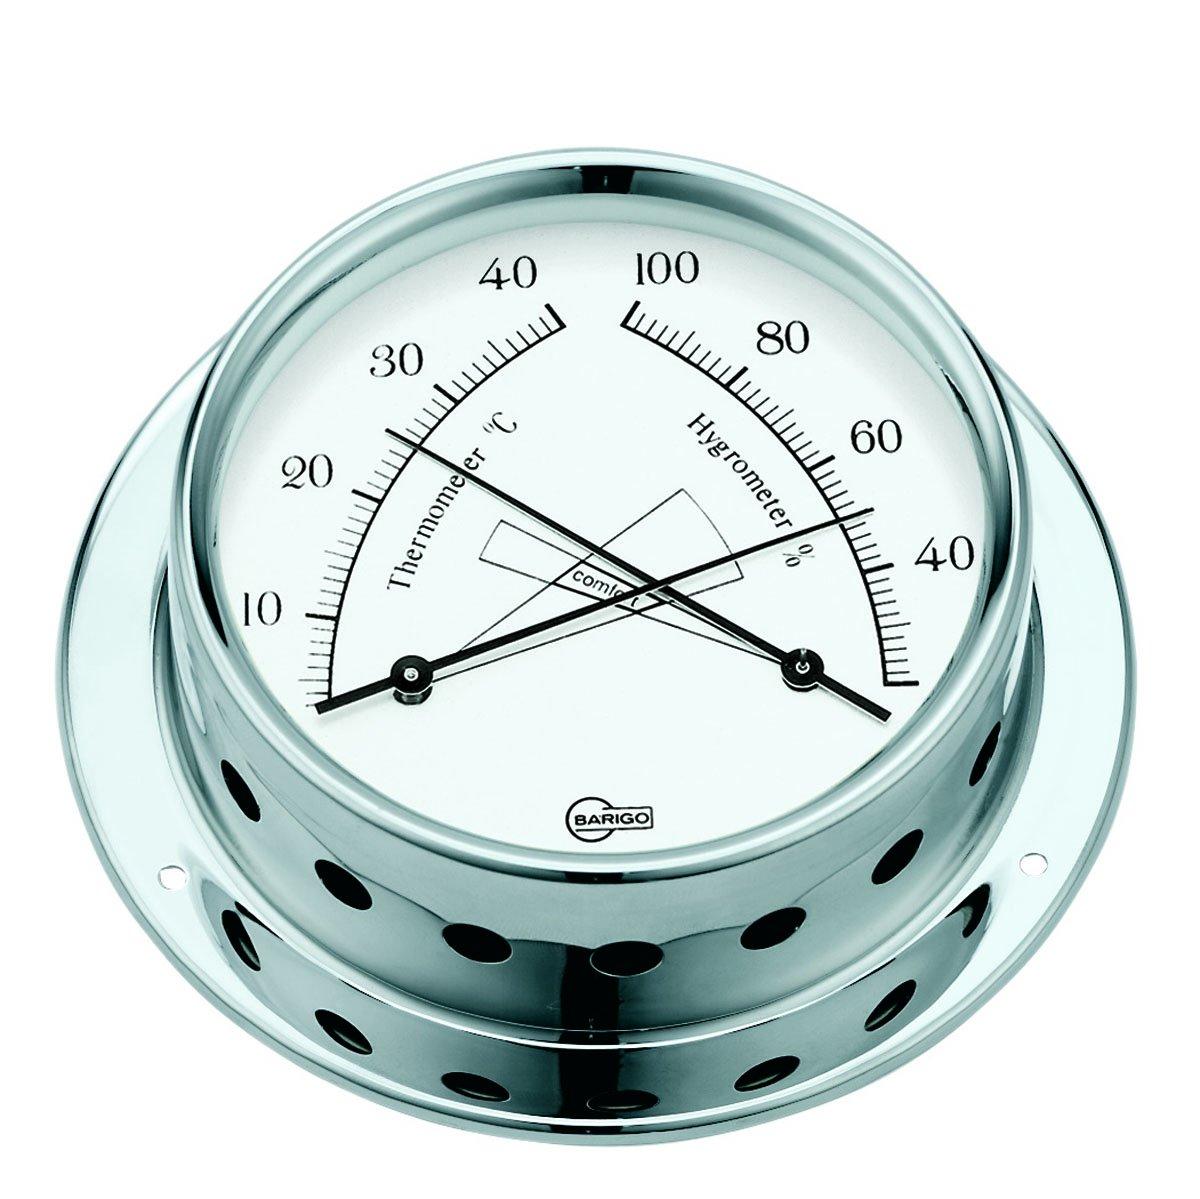 Barigo Termometro/Igrometro Tempo Cromo 983CR